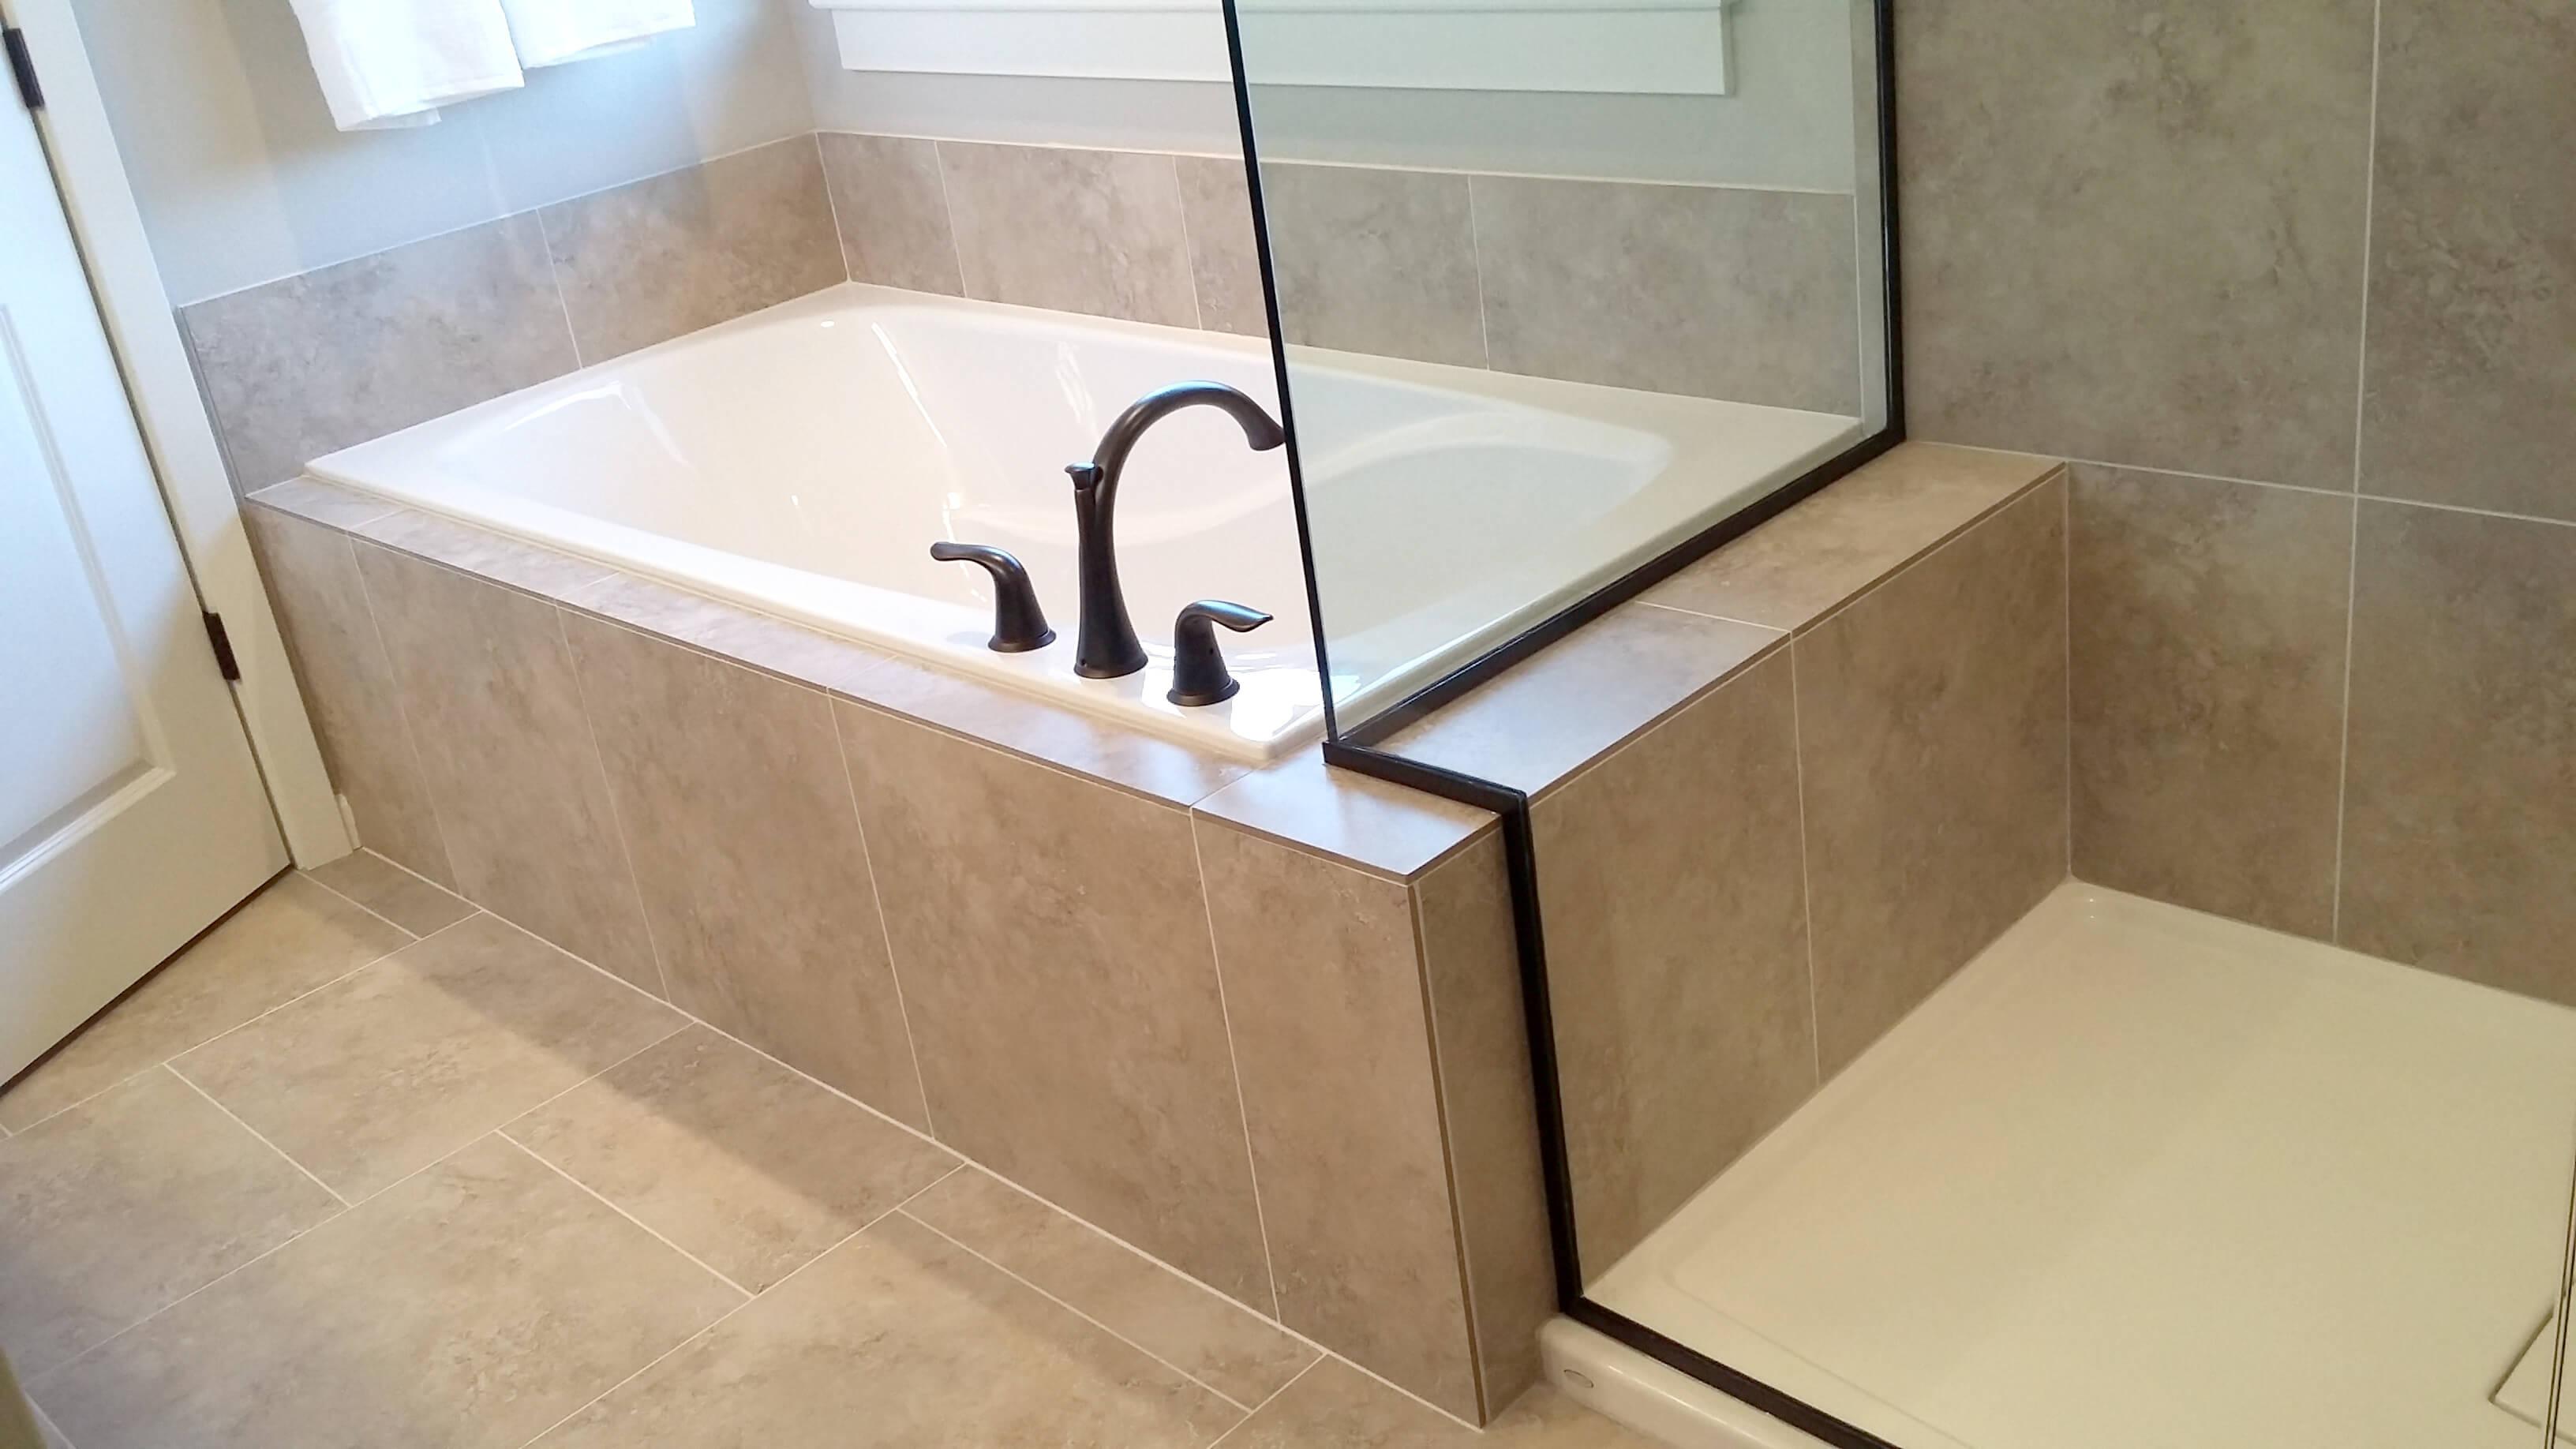 Tubs Tile Surrounding - YZPN Master Construction